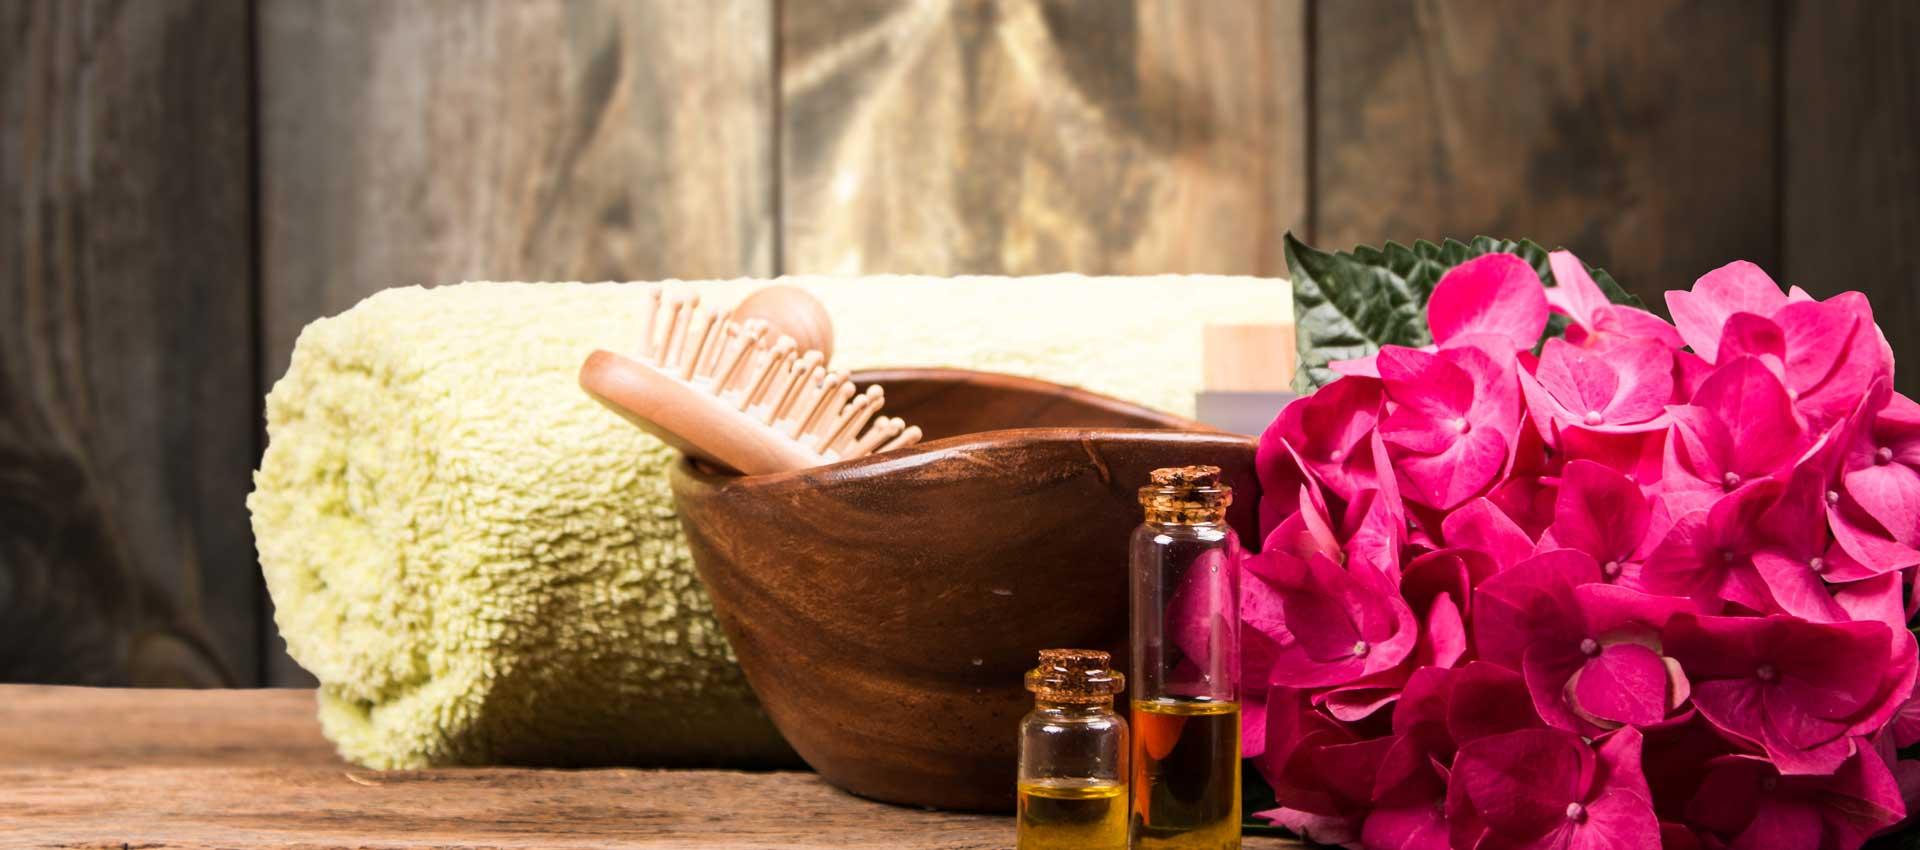 Spa and massage setting on wood